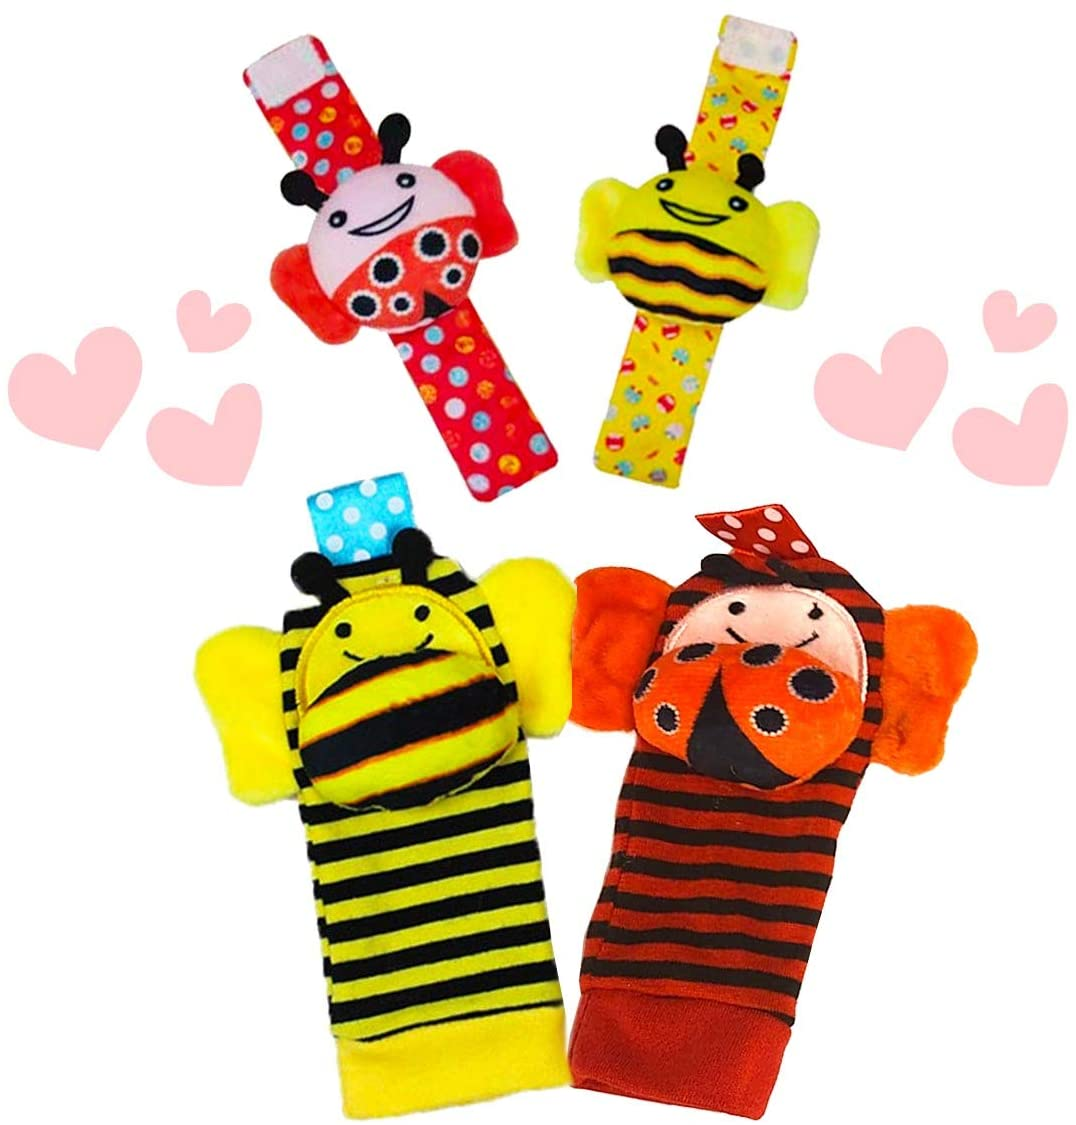 The Season Toys 4pcs Infant Baby Wrist Rattles and Foot Socks Developmental Toys – Ladybug/Bee